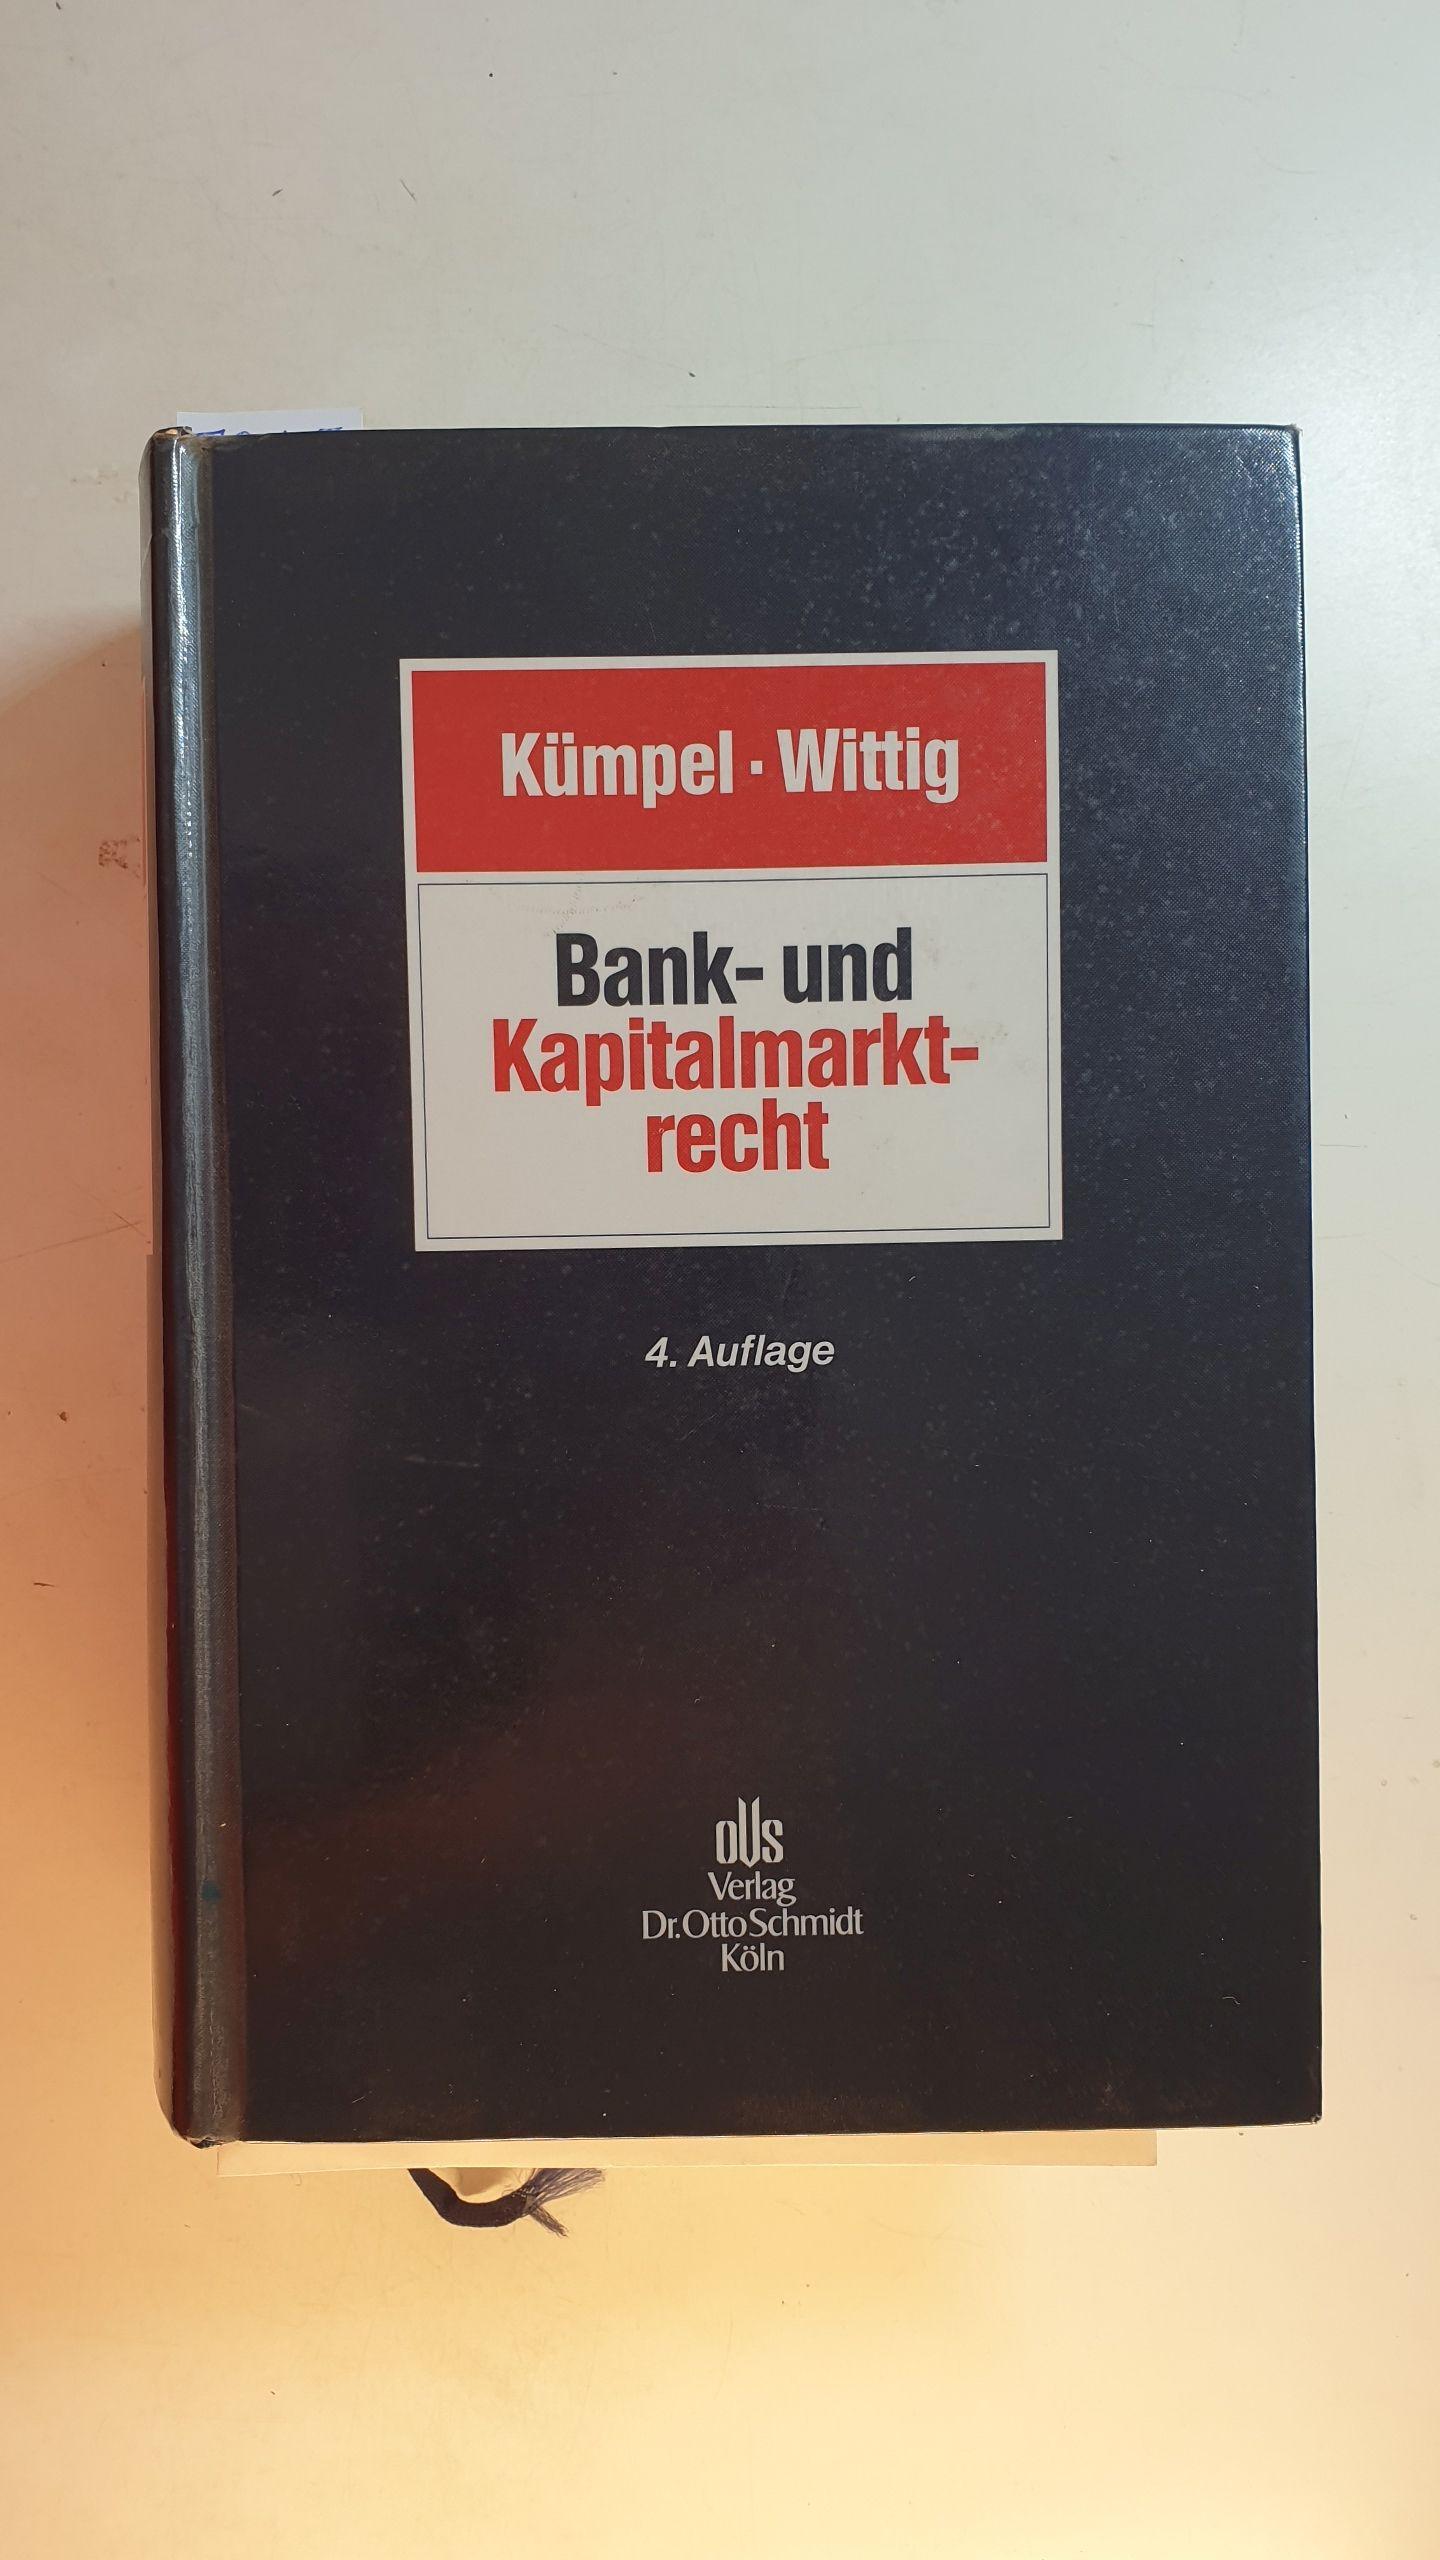 Bank- und Kapitalmarktrecht. 4., neu bearb. Aufl. - Kümpel, Siegfried [Begr.]  Wittig, Arne [Hrsg.]  Bauer, Frieder